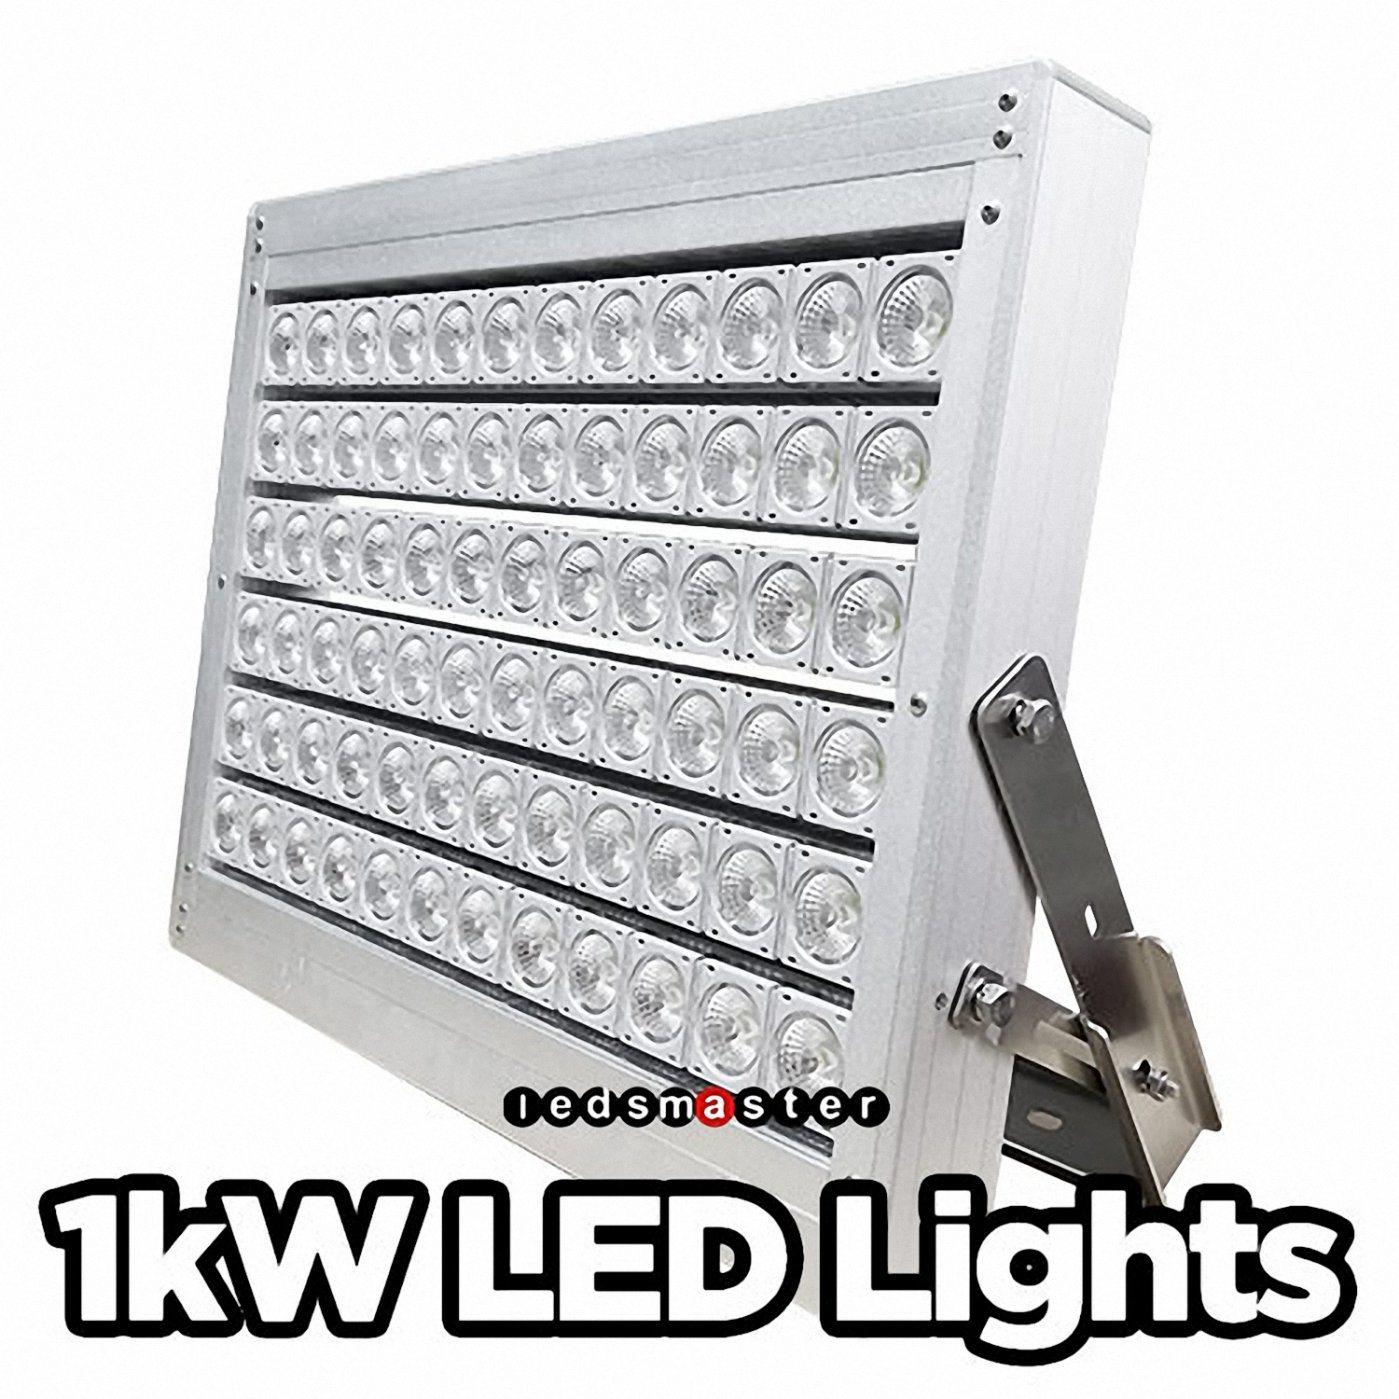 1000 Watt Metal Halide Led Replacement [hot item] professional outdoor stadium light high power 1000 watt for  metal halide replacement